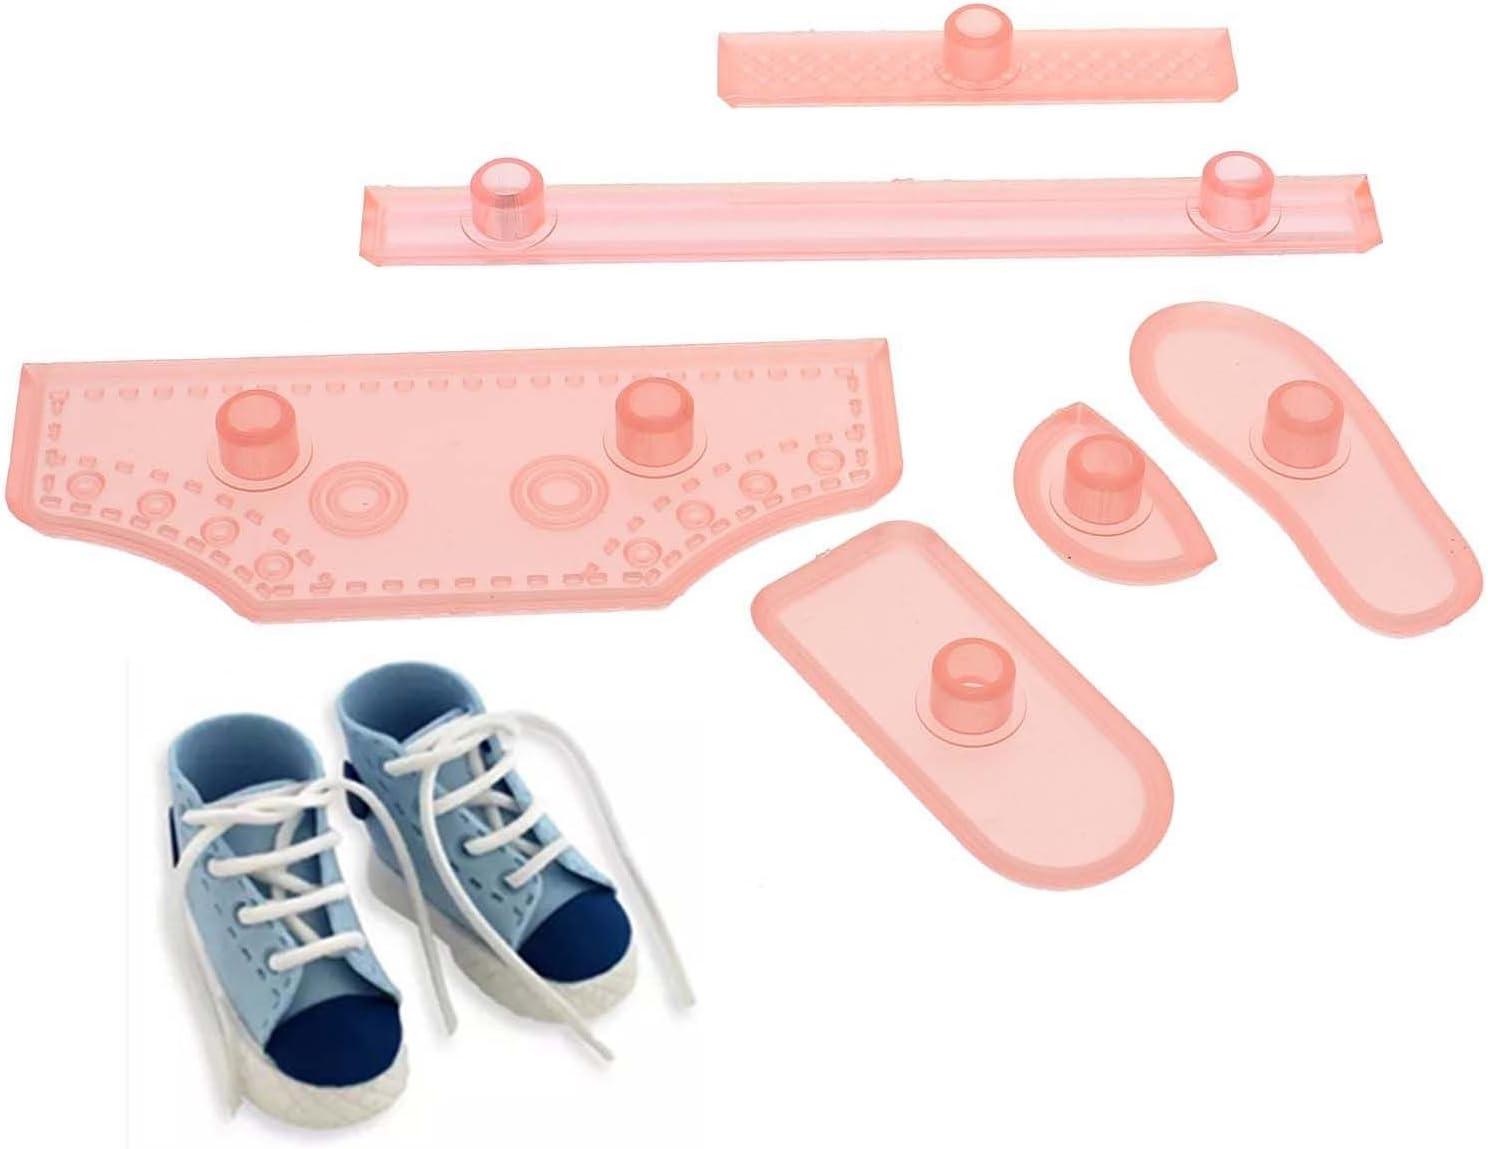 6/St/ück Kuchen/Messer/Schuhe Schuhe/dekorative/Backform/DIY Fertigkeit-Versorgungs